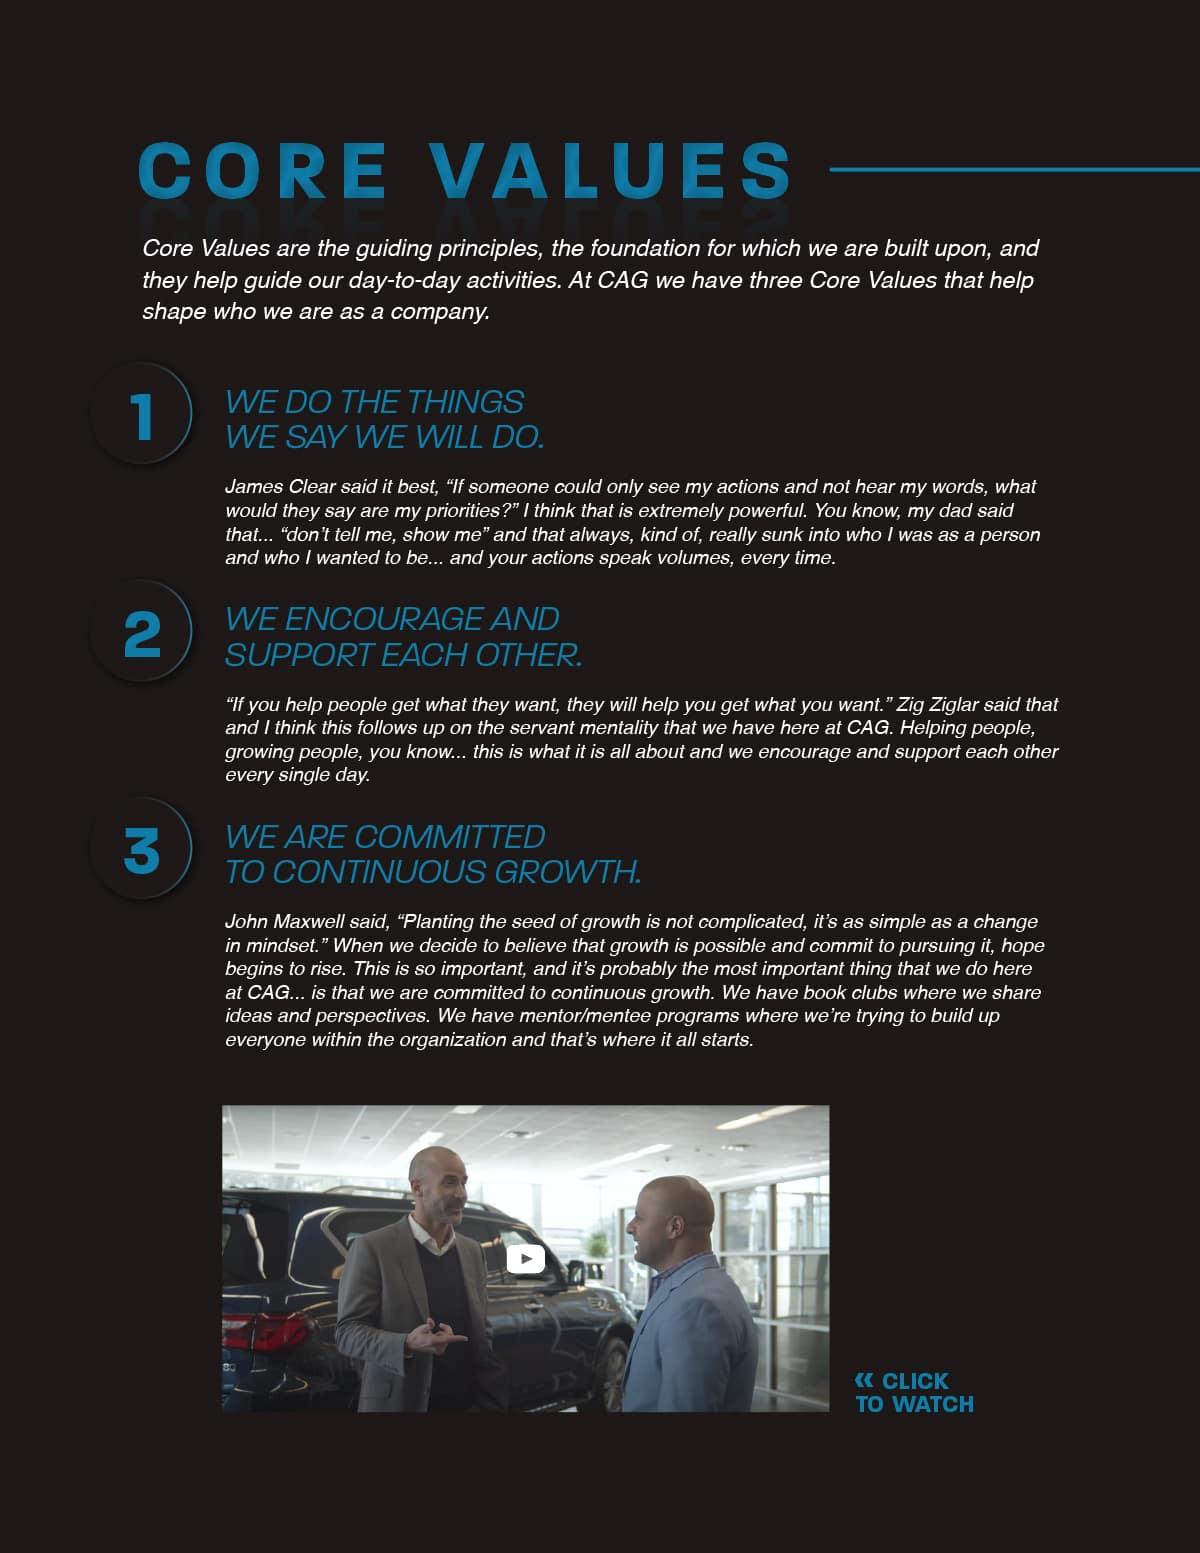 cag core values continental